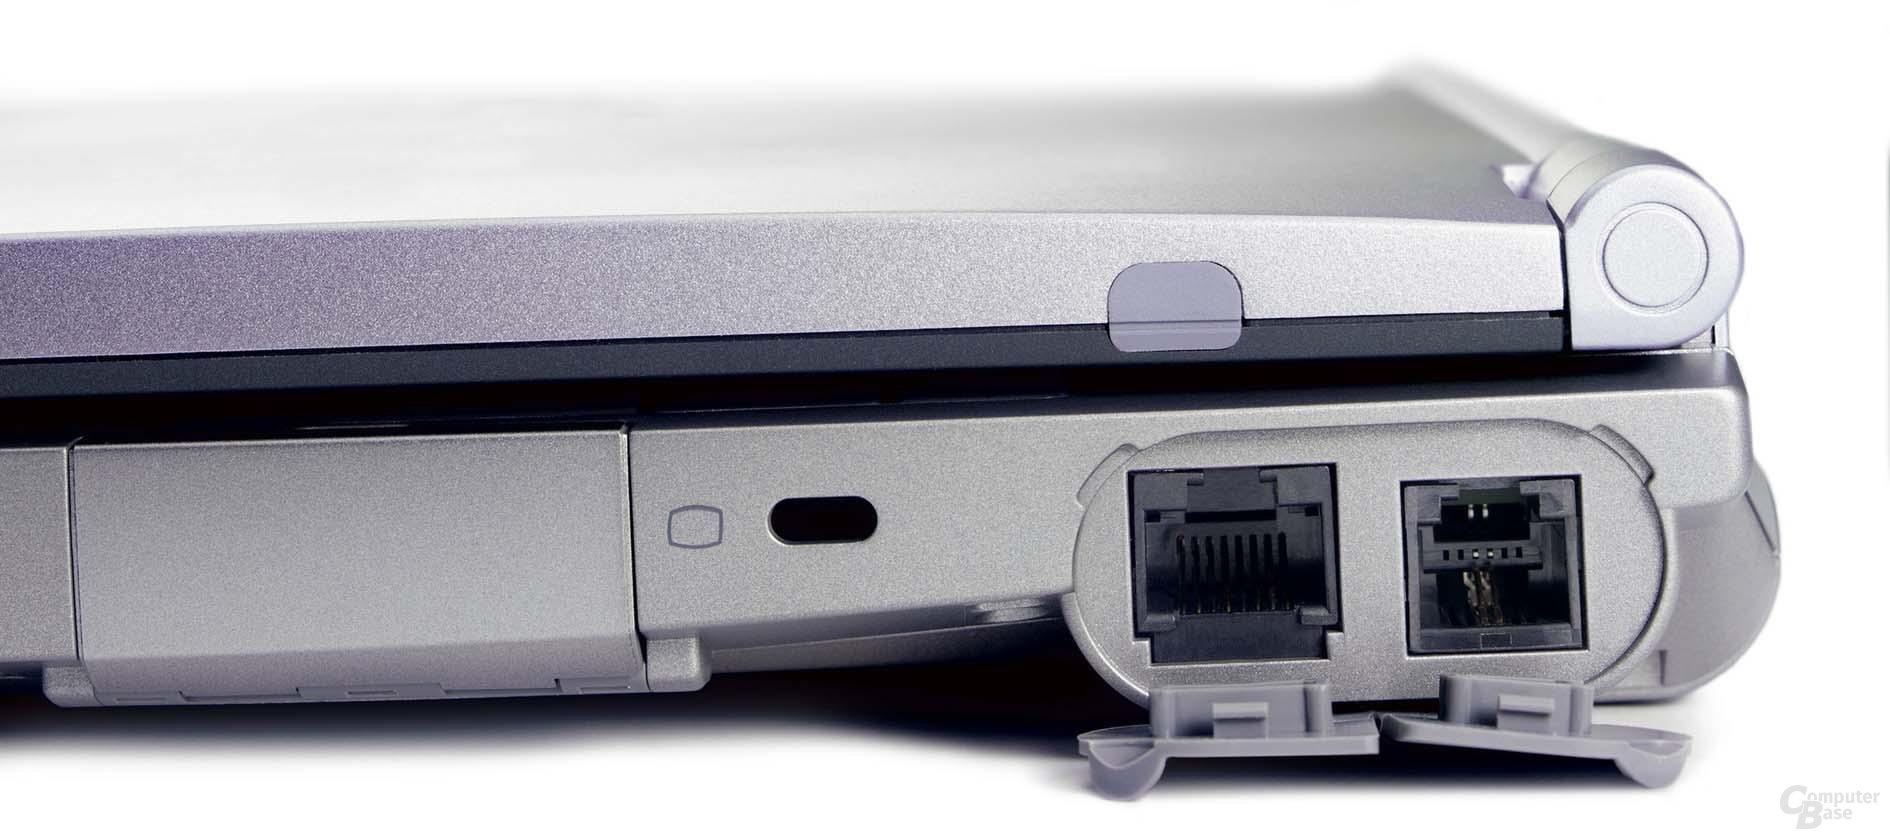 Sony R600HFP